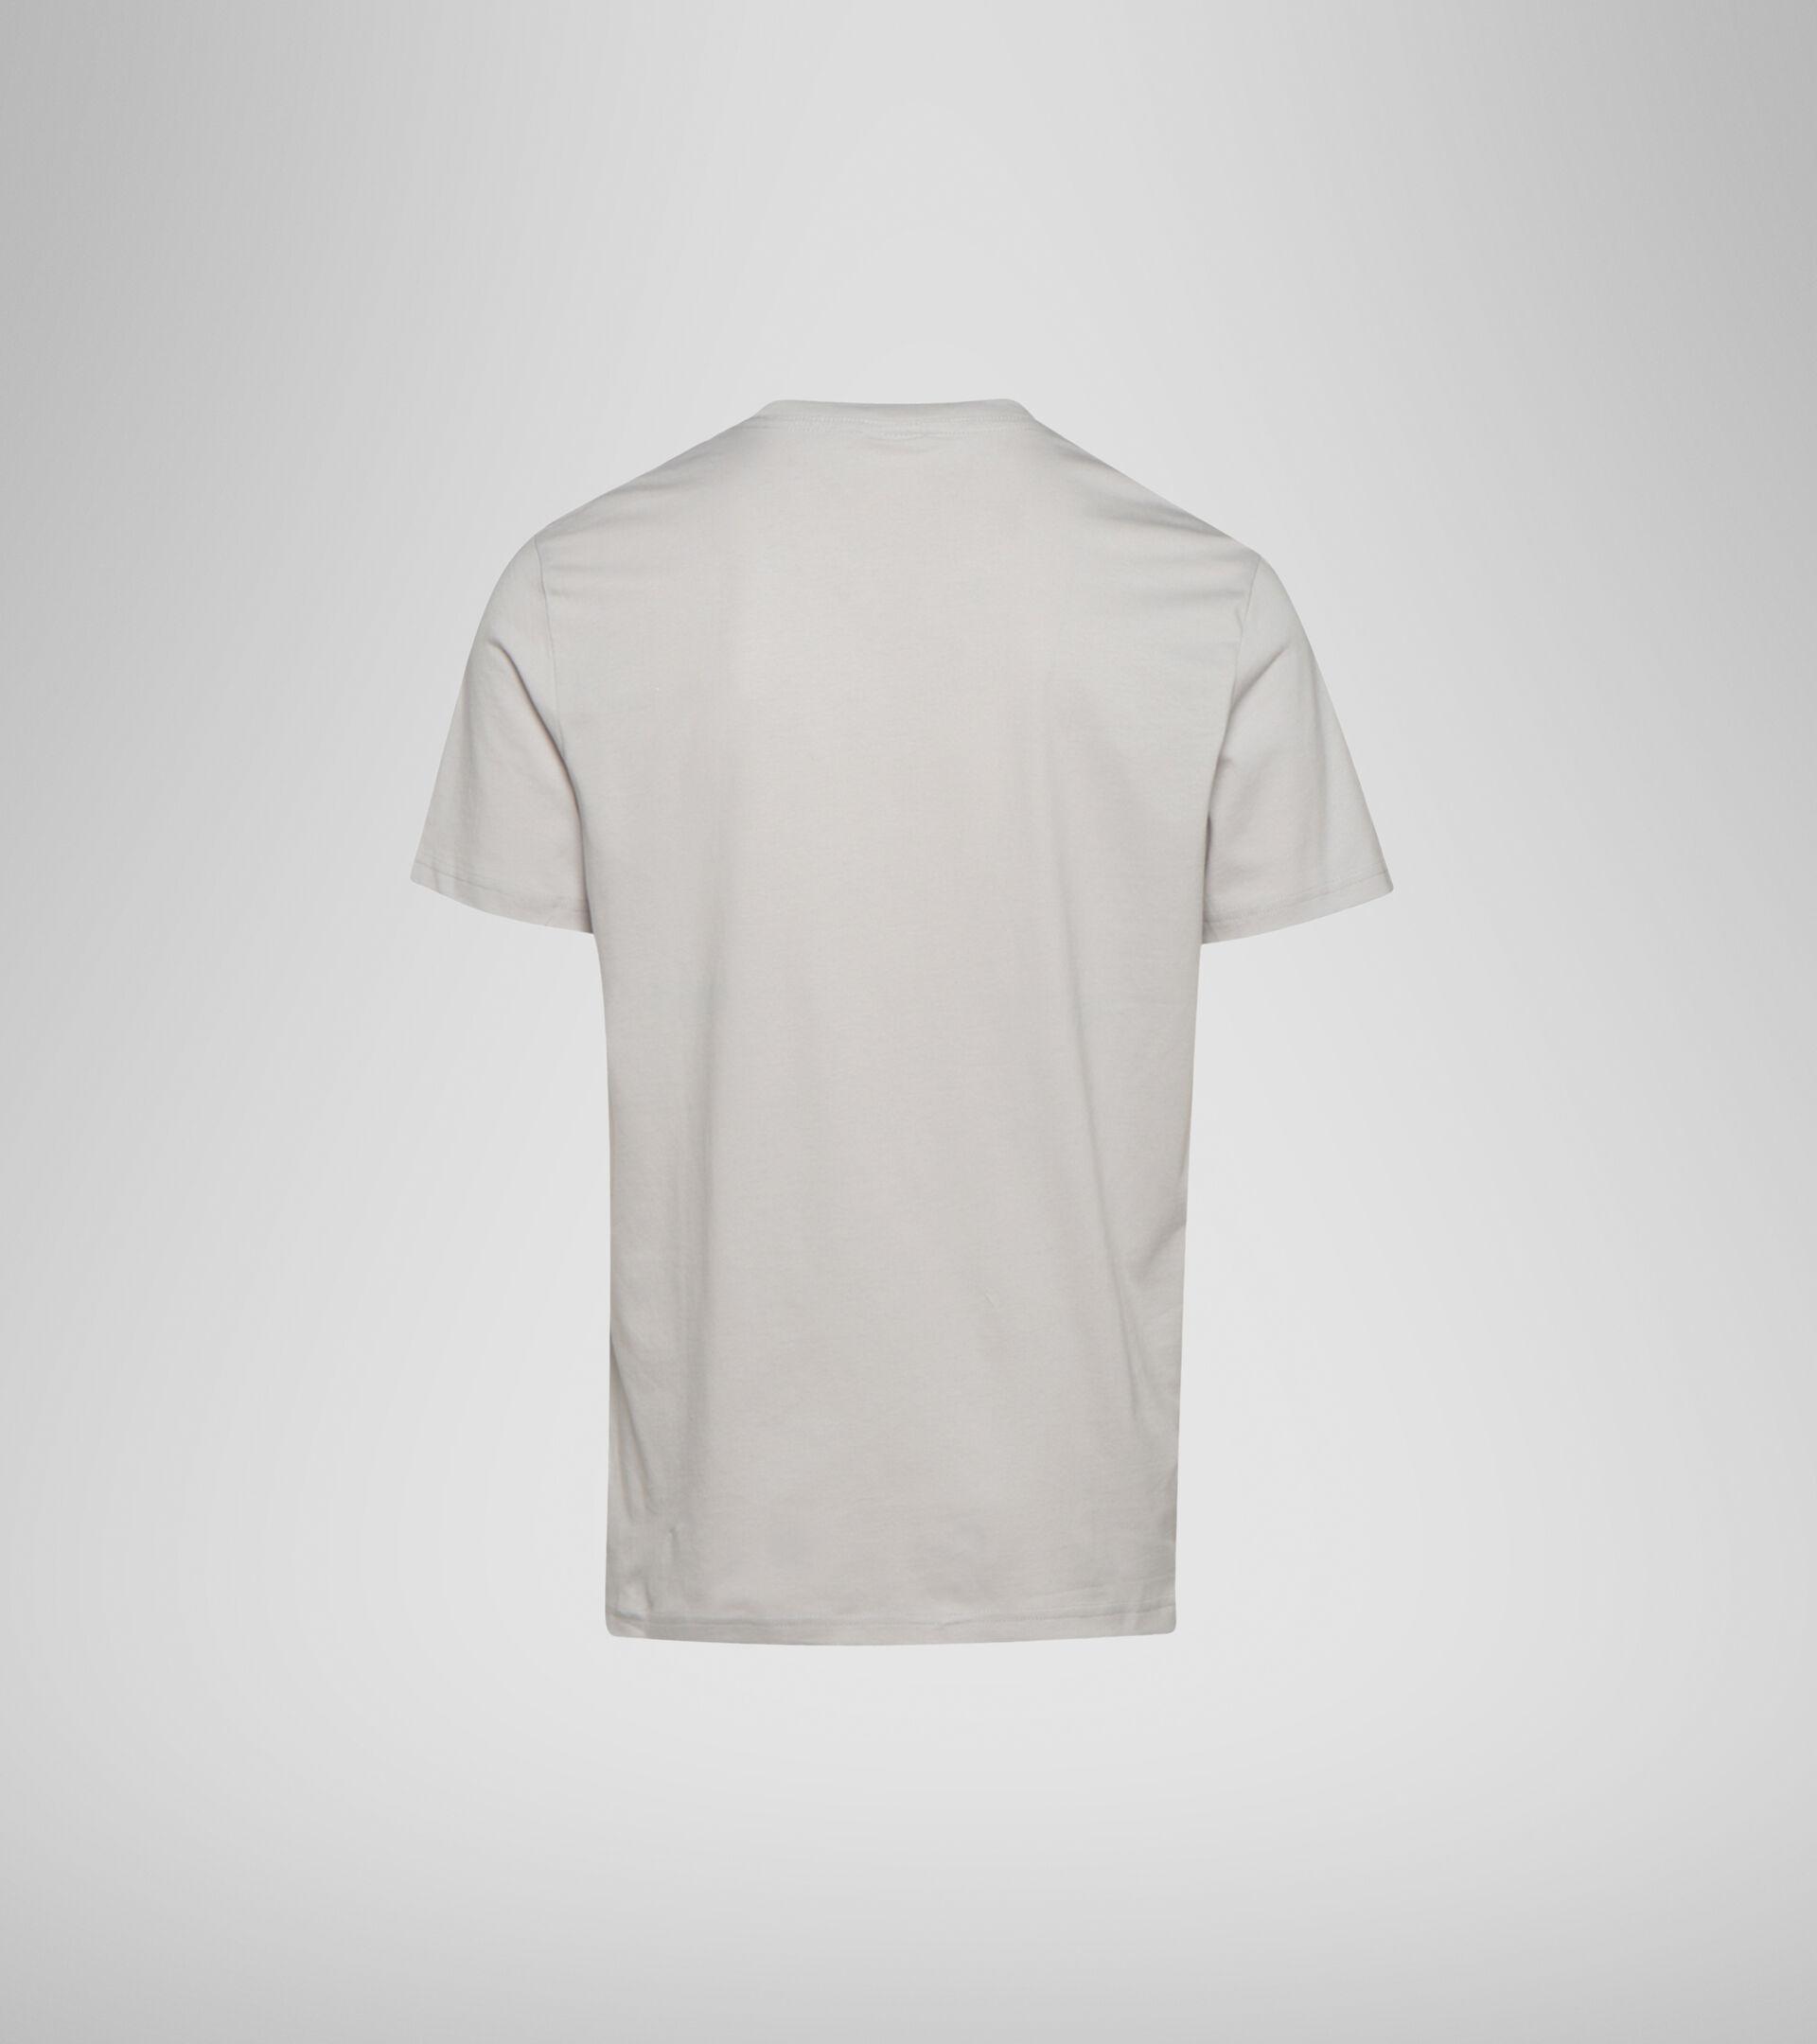 Apparel Sportswear UOMO SS T-SHIRT SPECTRA OC OYSTER MUSHROOM Diadora